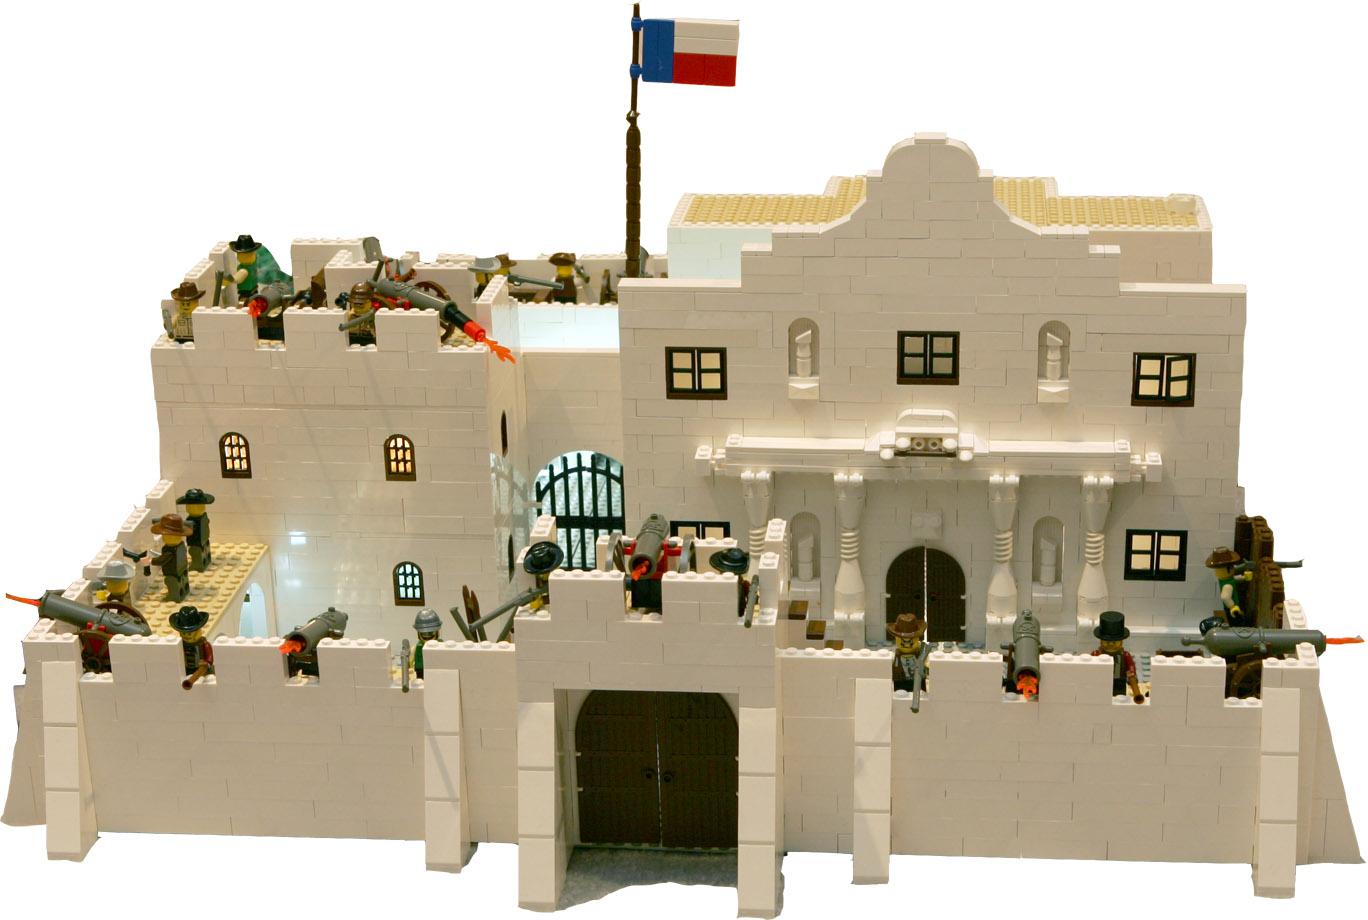 Wild west color palette lego historic themes for Old west color palette